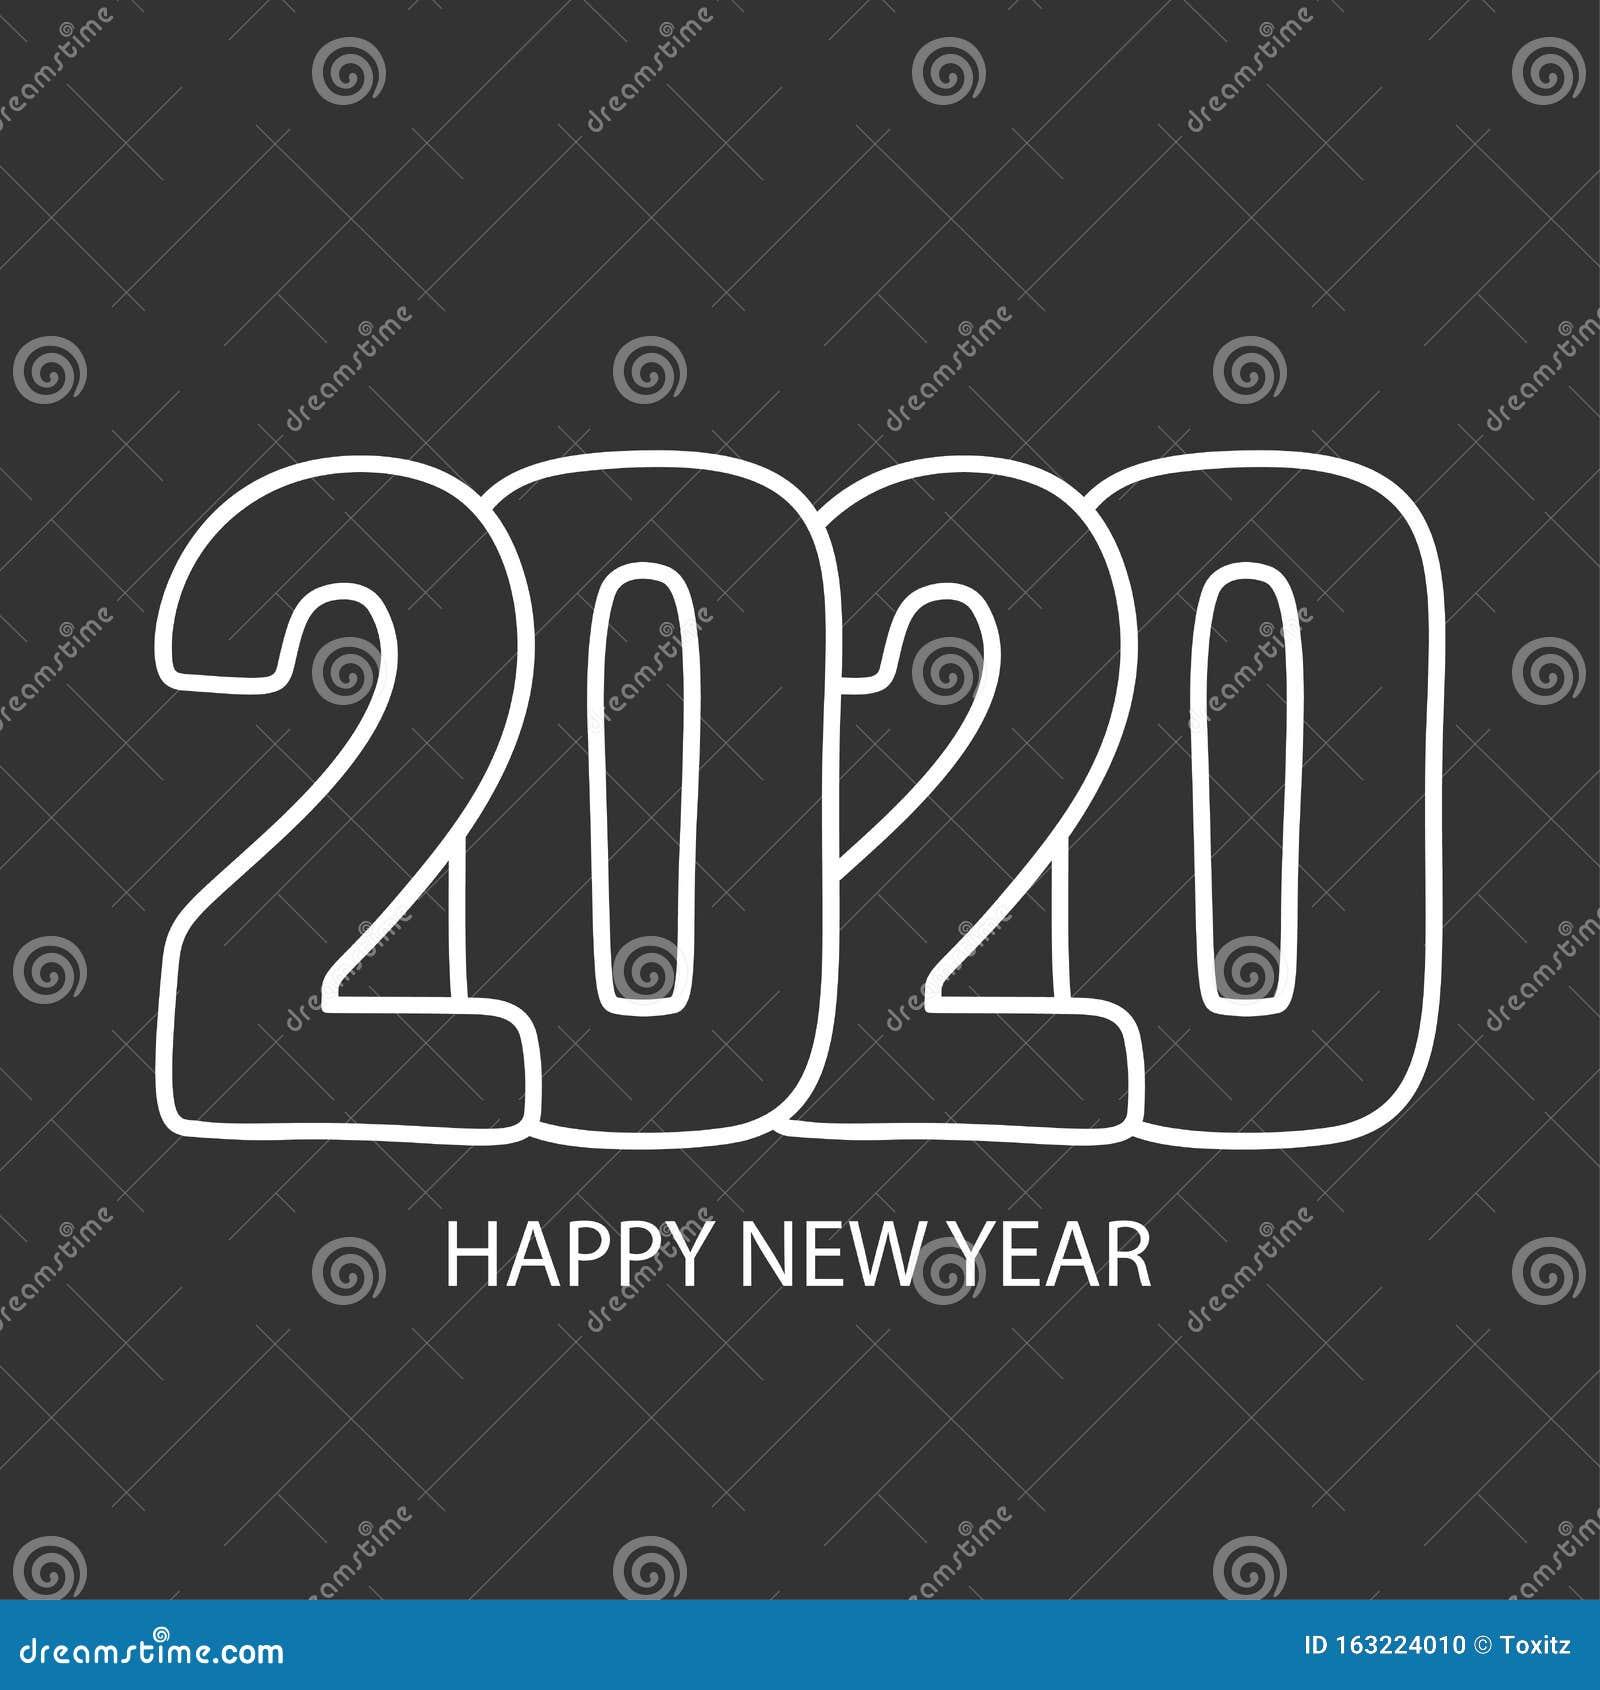 Happy New Year 2020. Calendar Cover, Brochure Design, Card